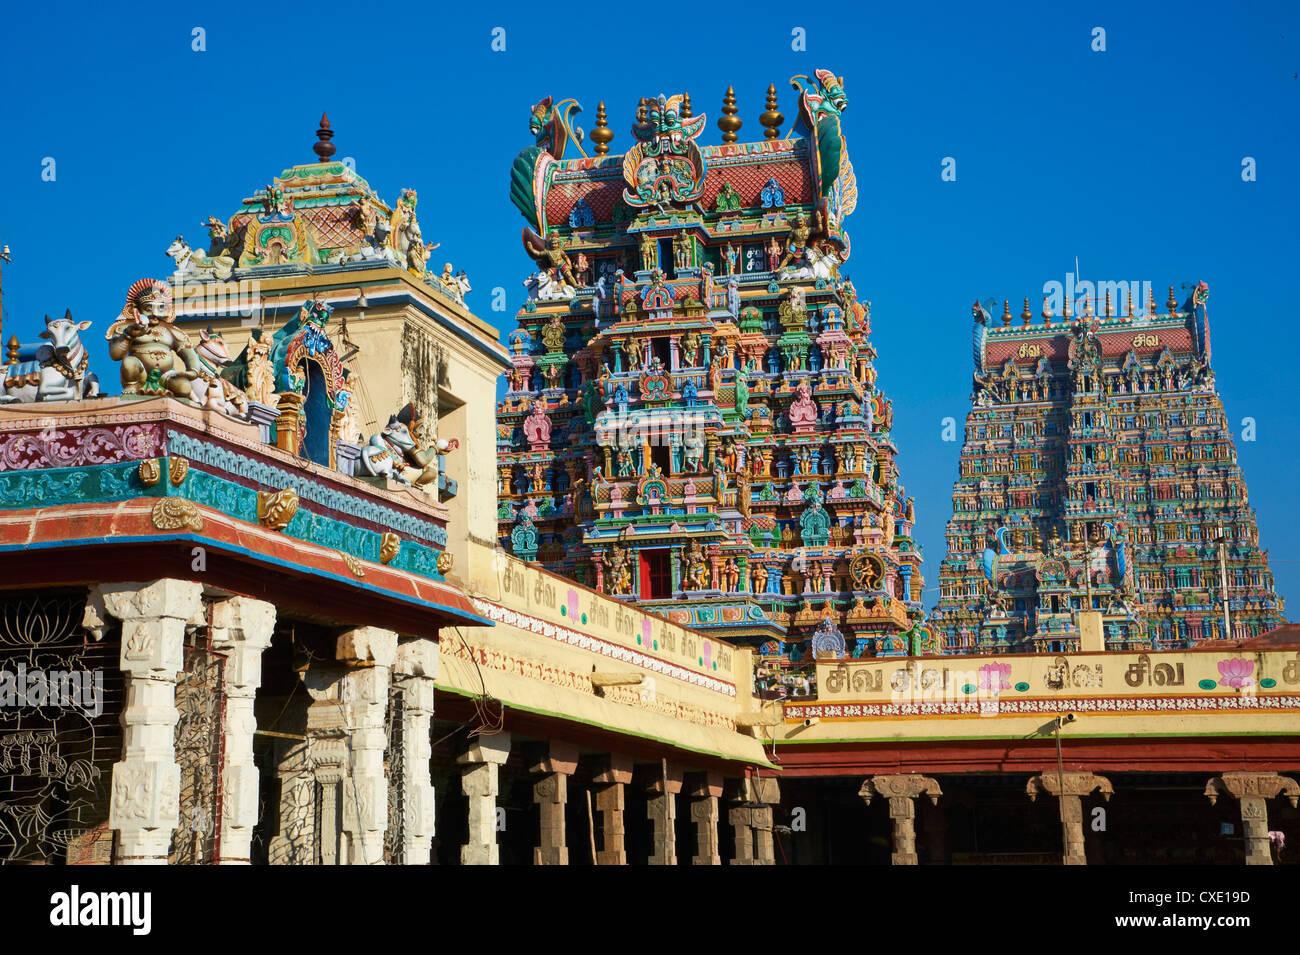 Sri Meenakshi temple, Madurai, Tamil Nadu, India, Asia Immagini Stock